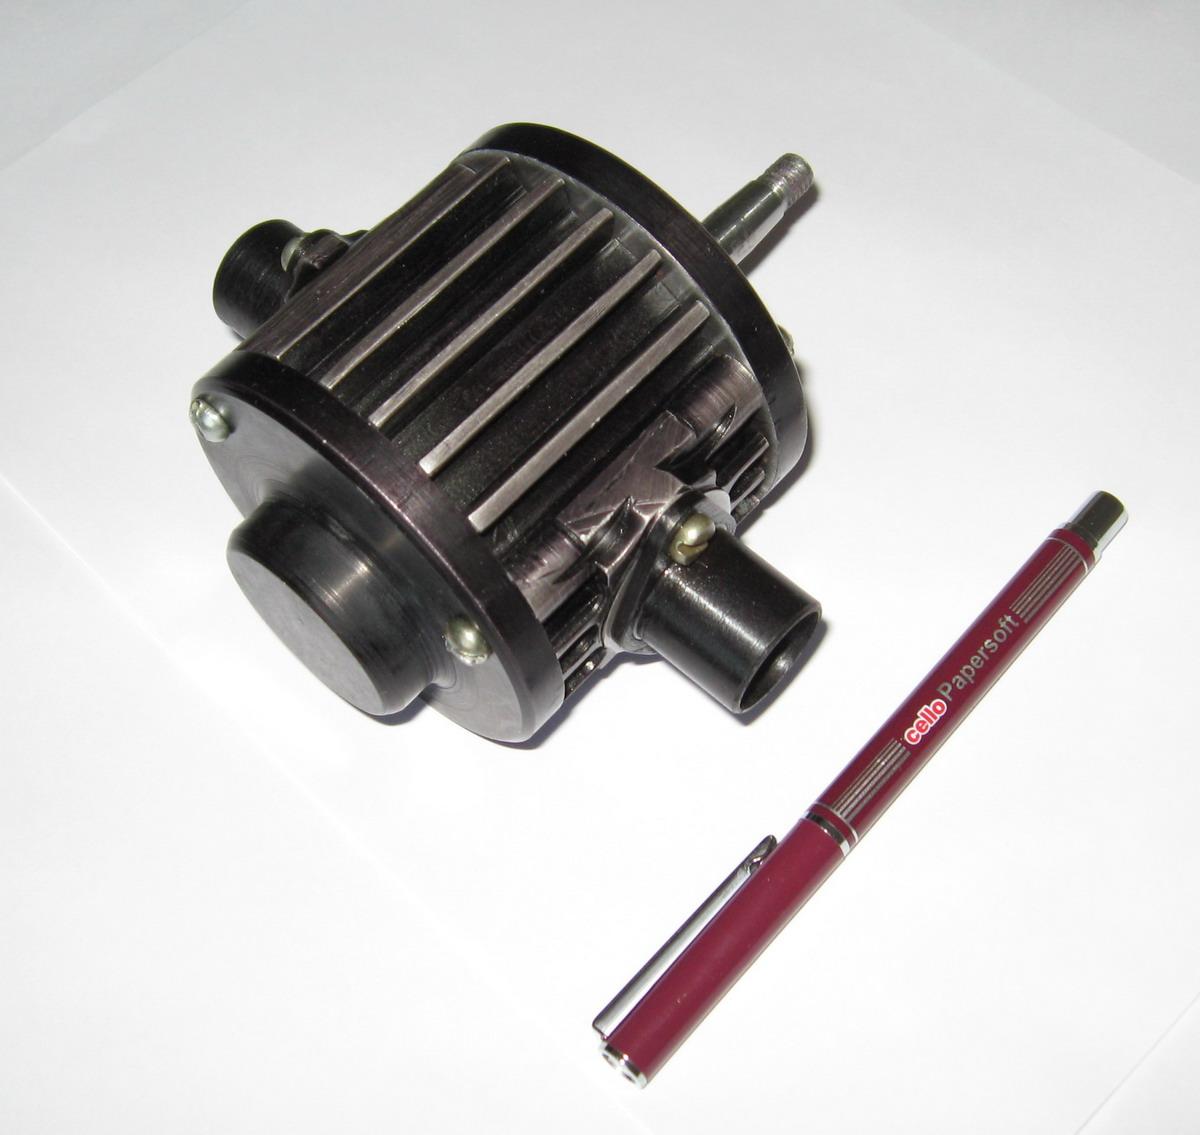 Supercharger (air compressor) for motorcycle, motor bike